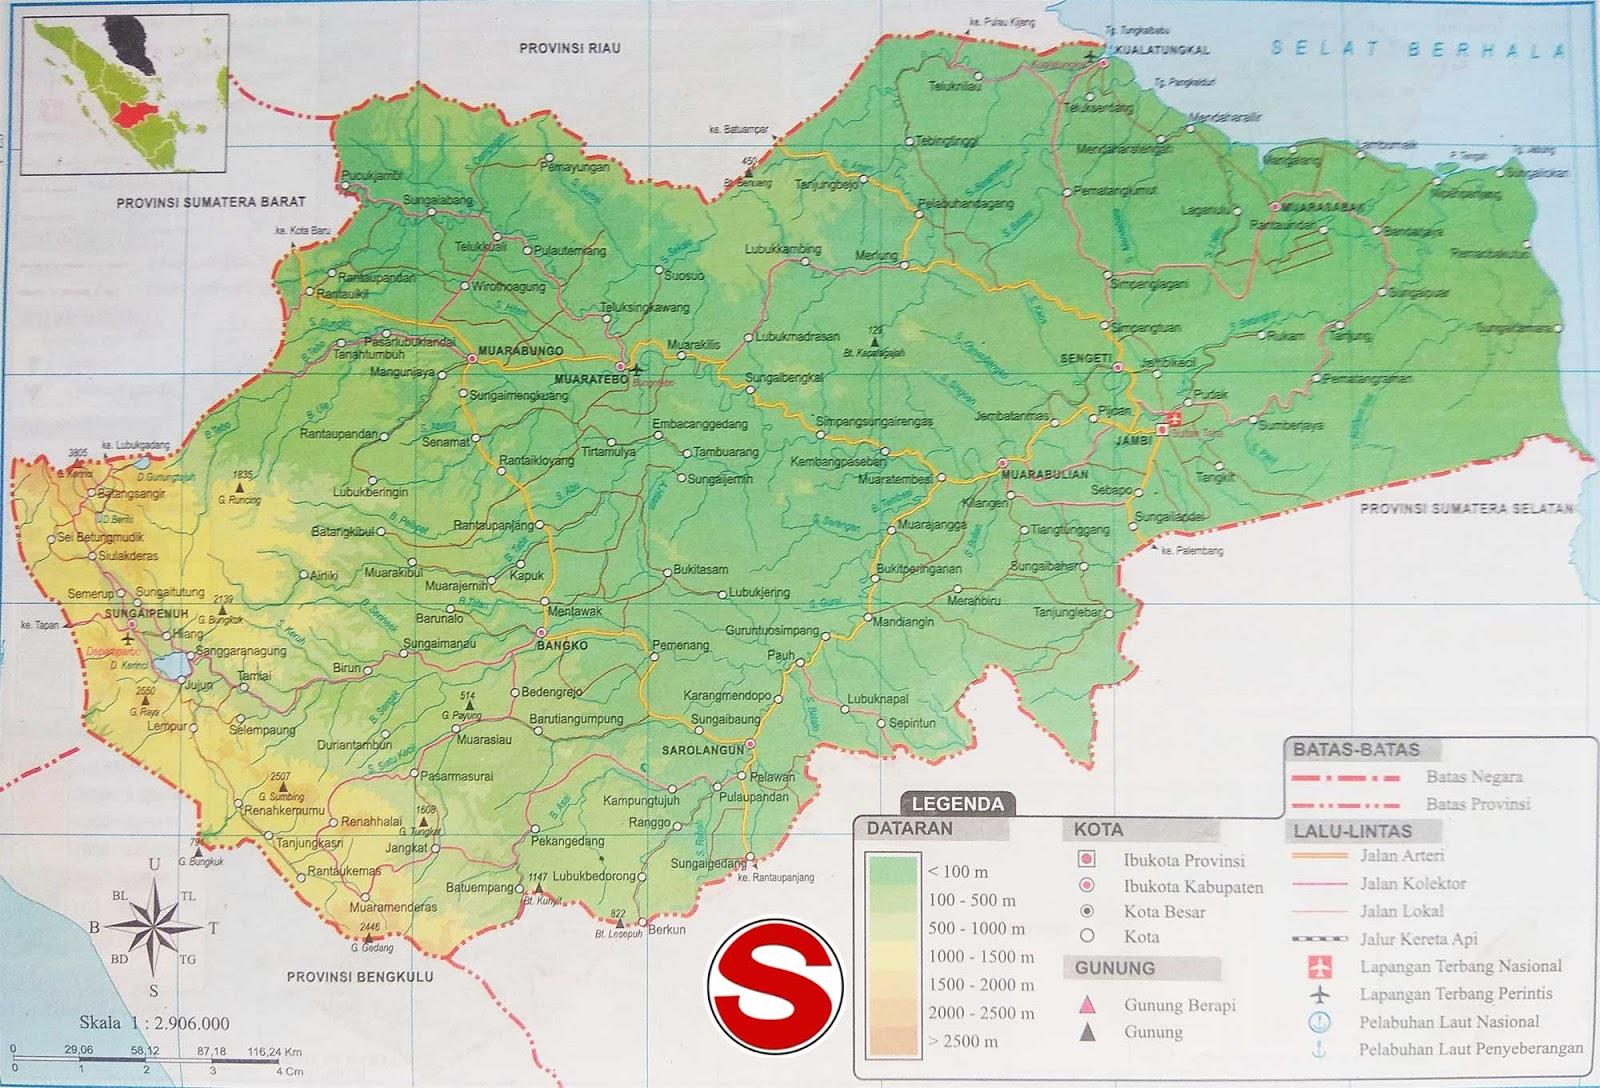 Peta Atlas Provinsi Jambi di bawah ini mencakup peta dataran Peta Atlas Provinsi Jambi